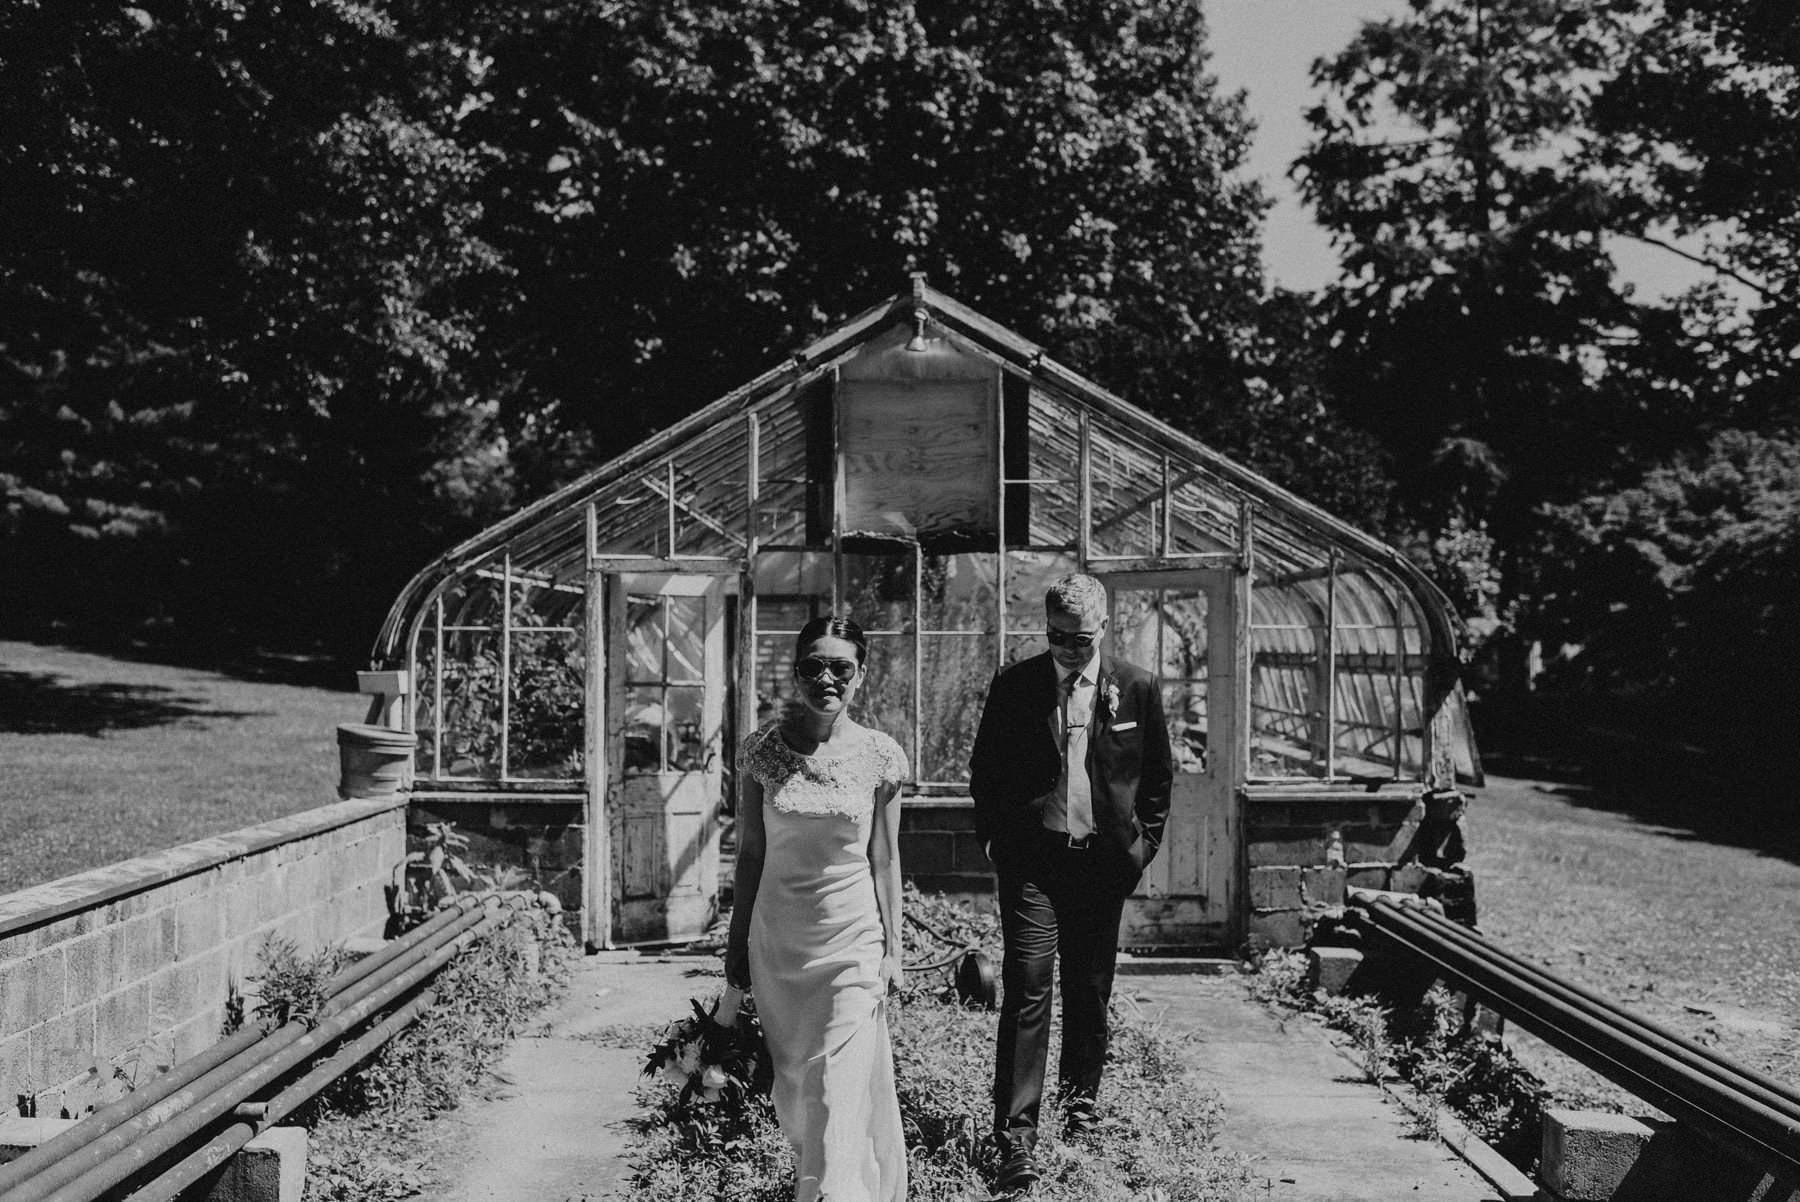 Appleford-estate-wedding-65.jpg